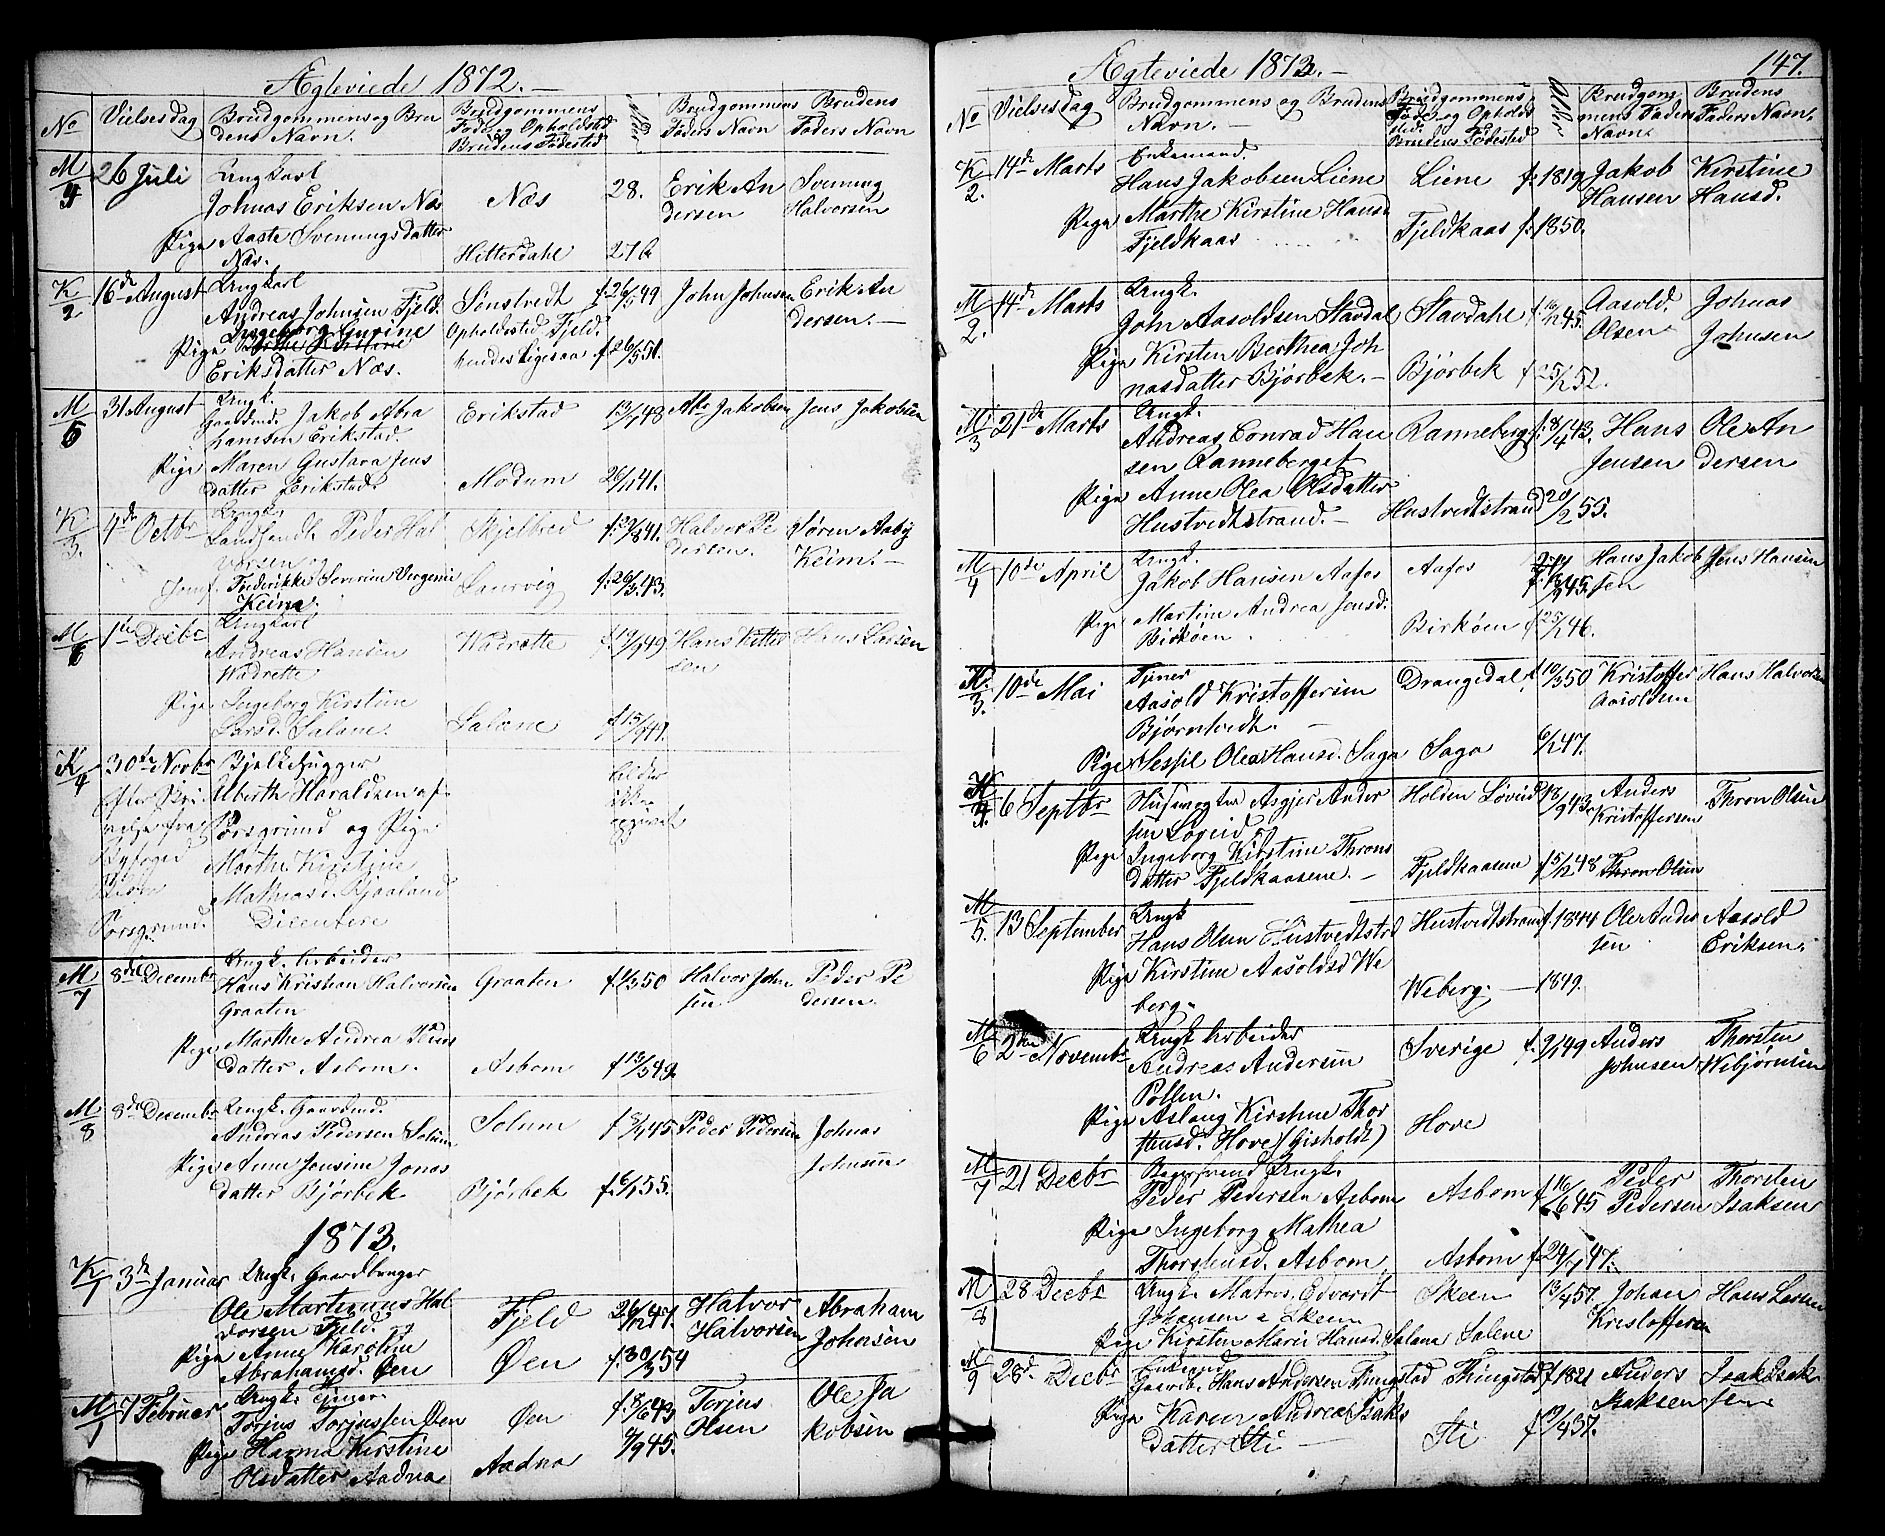 SAKO, Solum kirkebøker, G/Gb/L0002: Klokkerbok nr. II 2, 1859-1879, s. 147